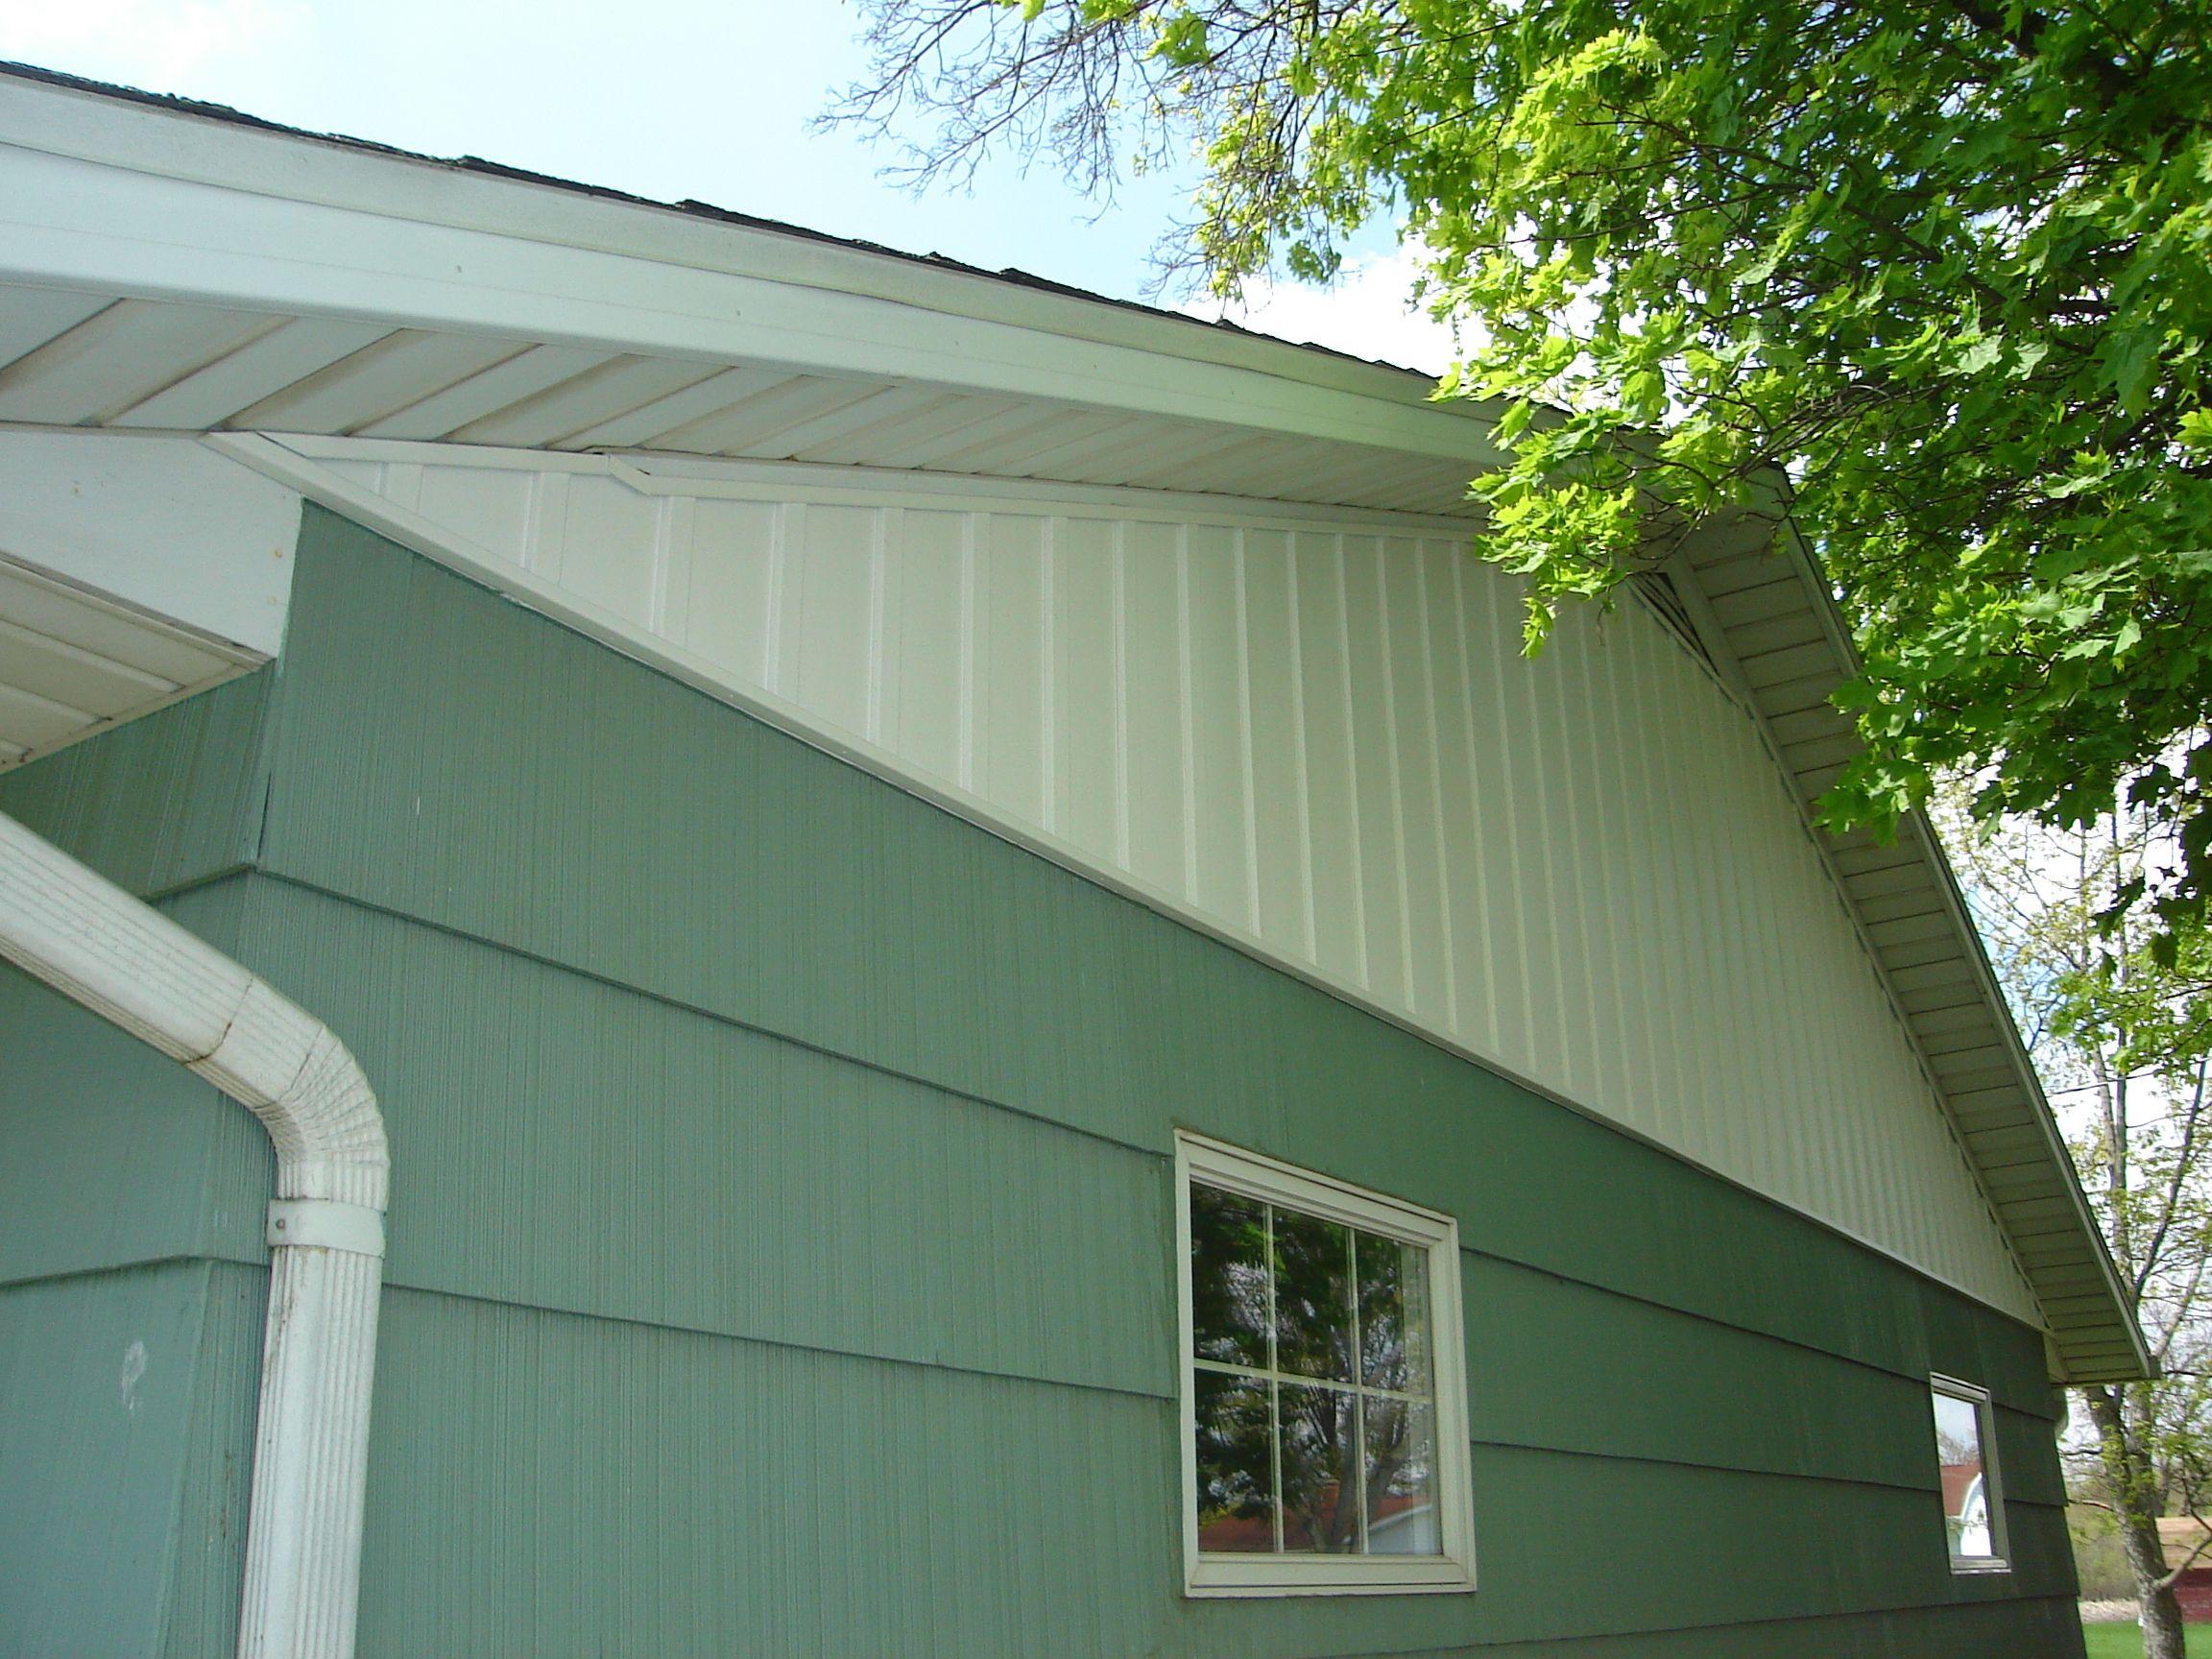 Vertical Contrasting Siding On Gable House Siding